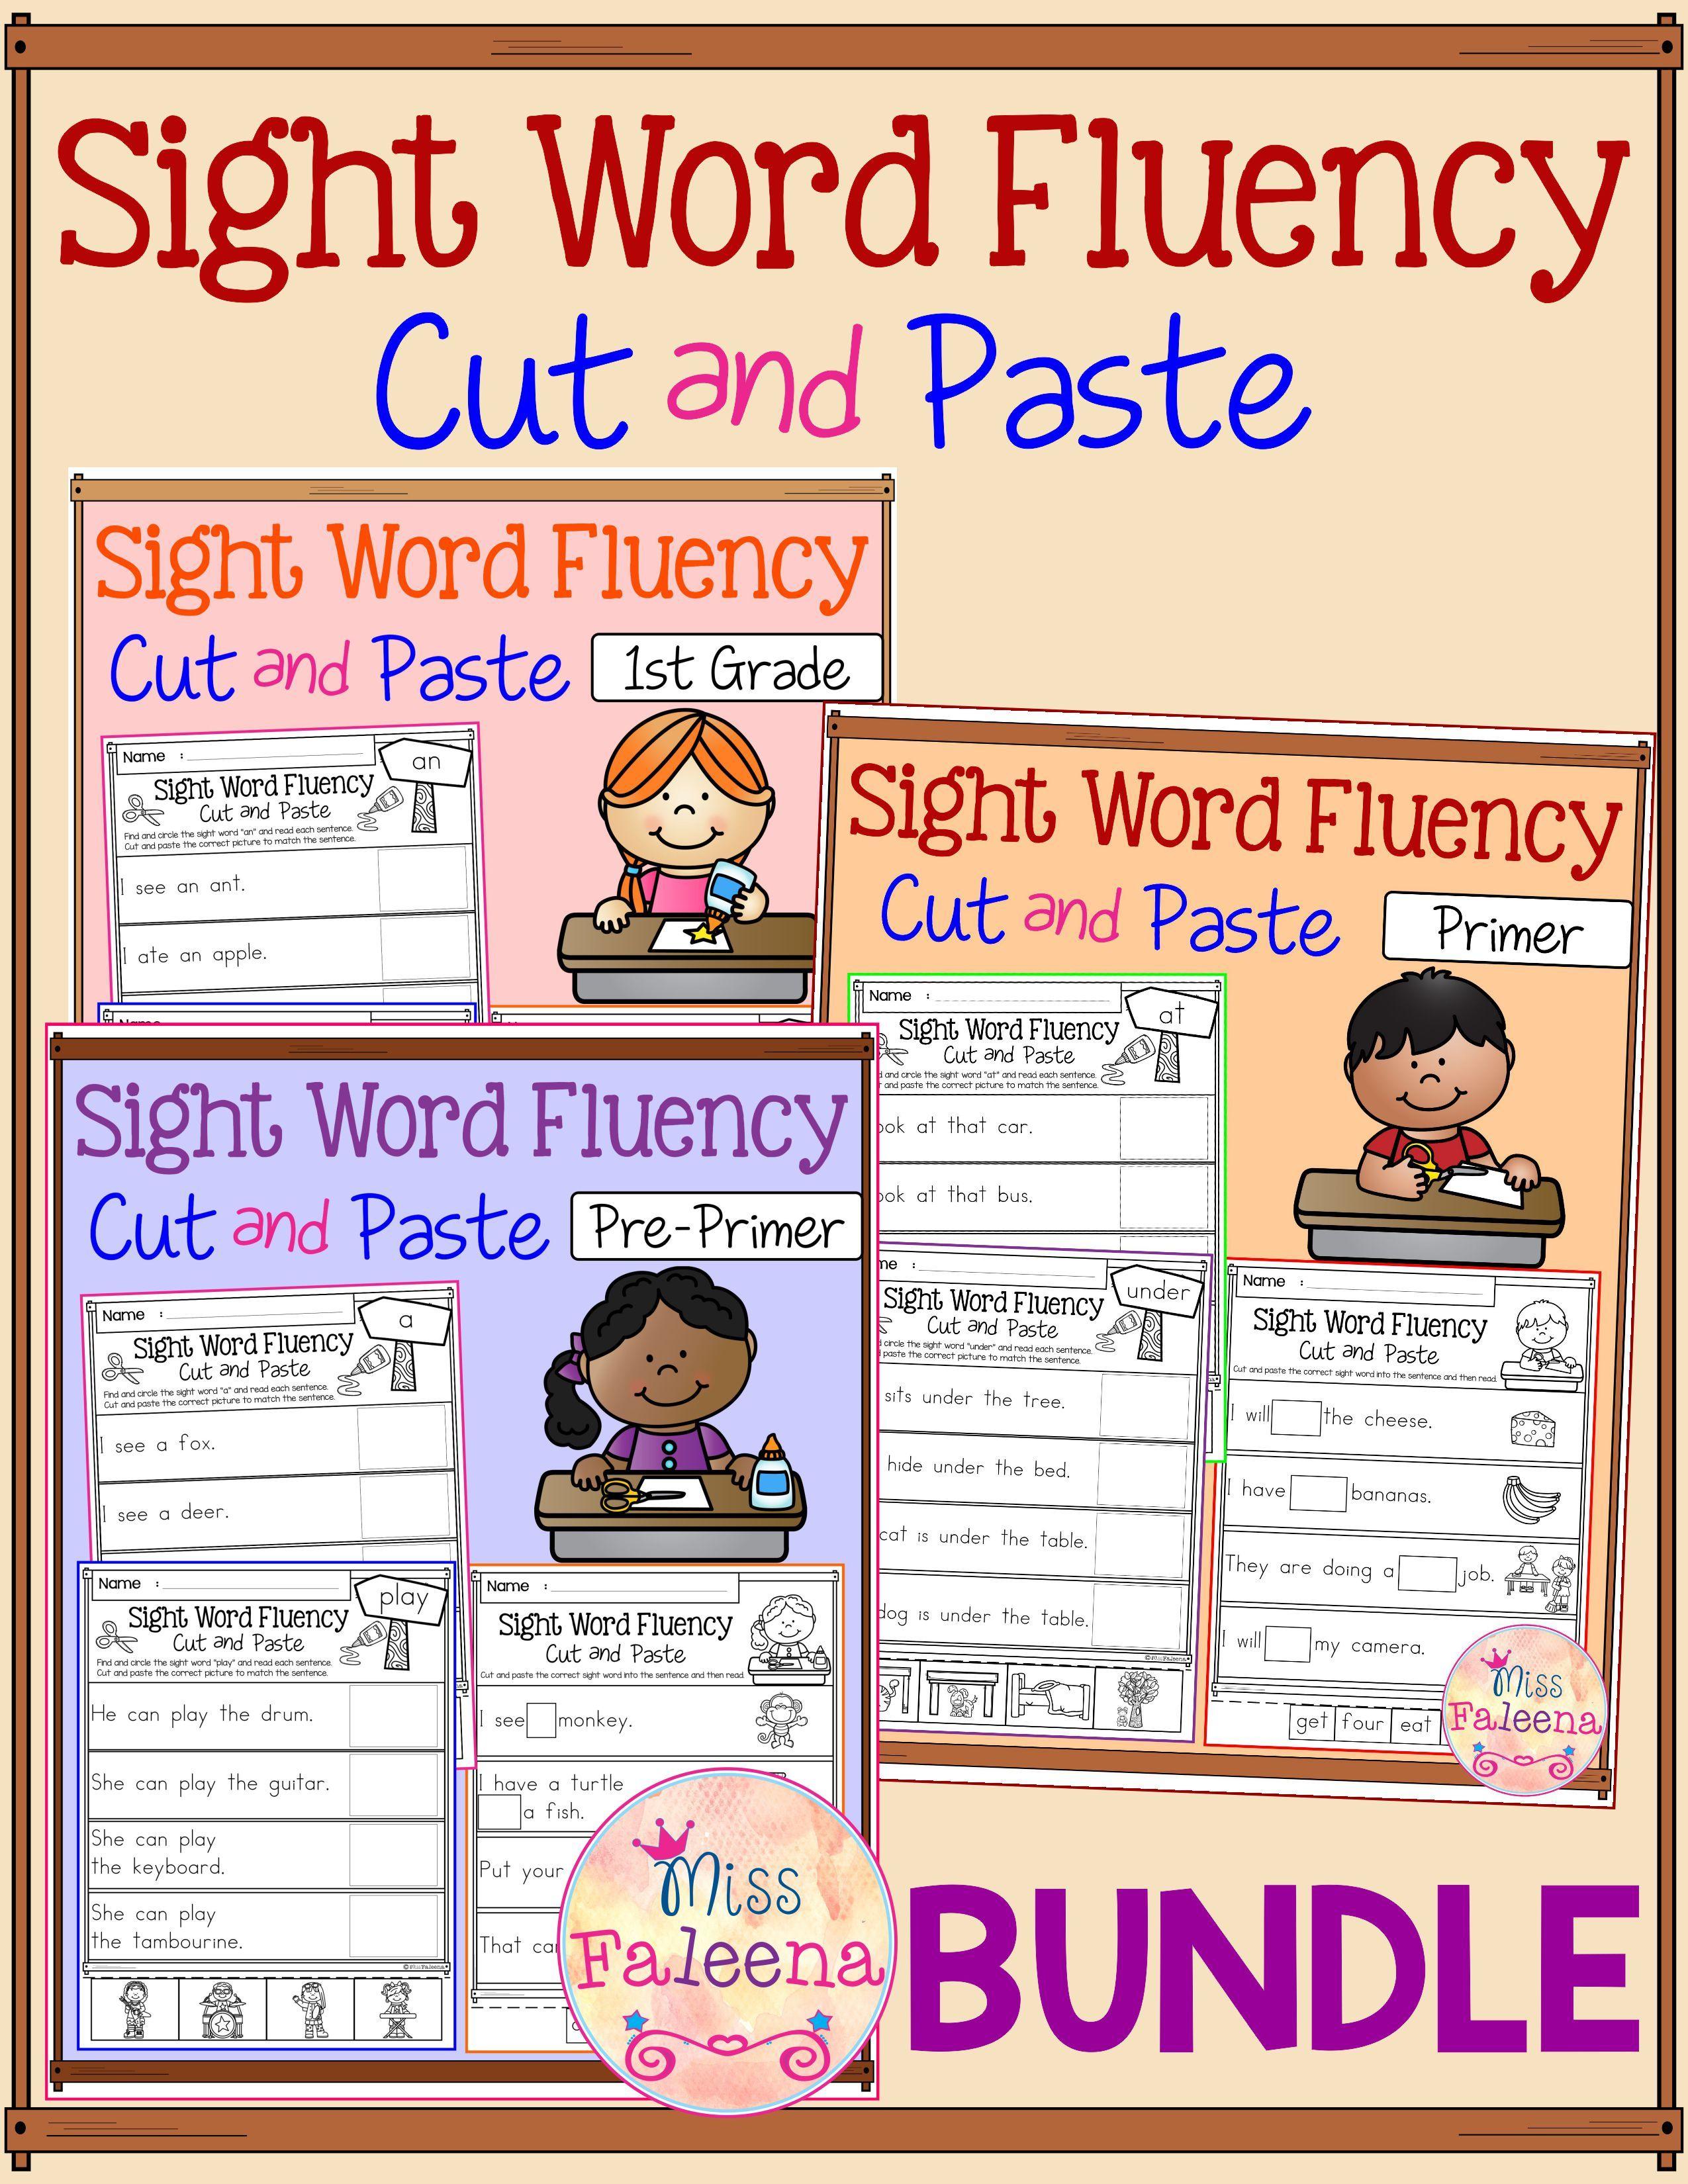 sight word fluency cut and paste the bundle pinterest pre primer